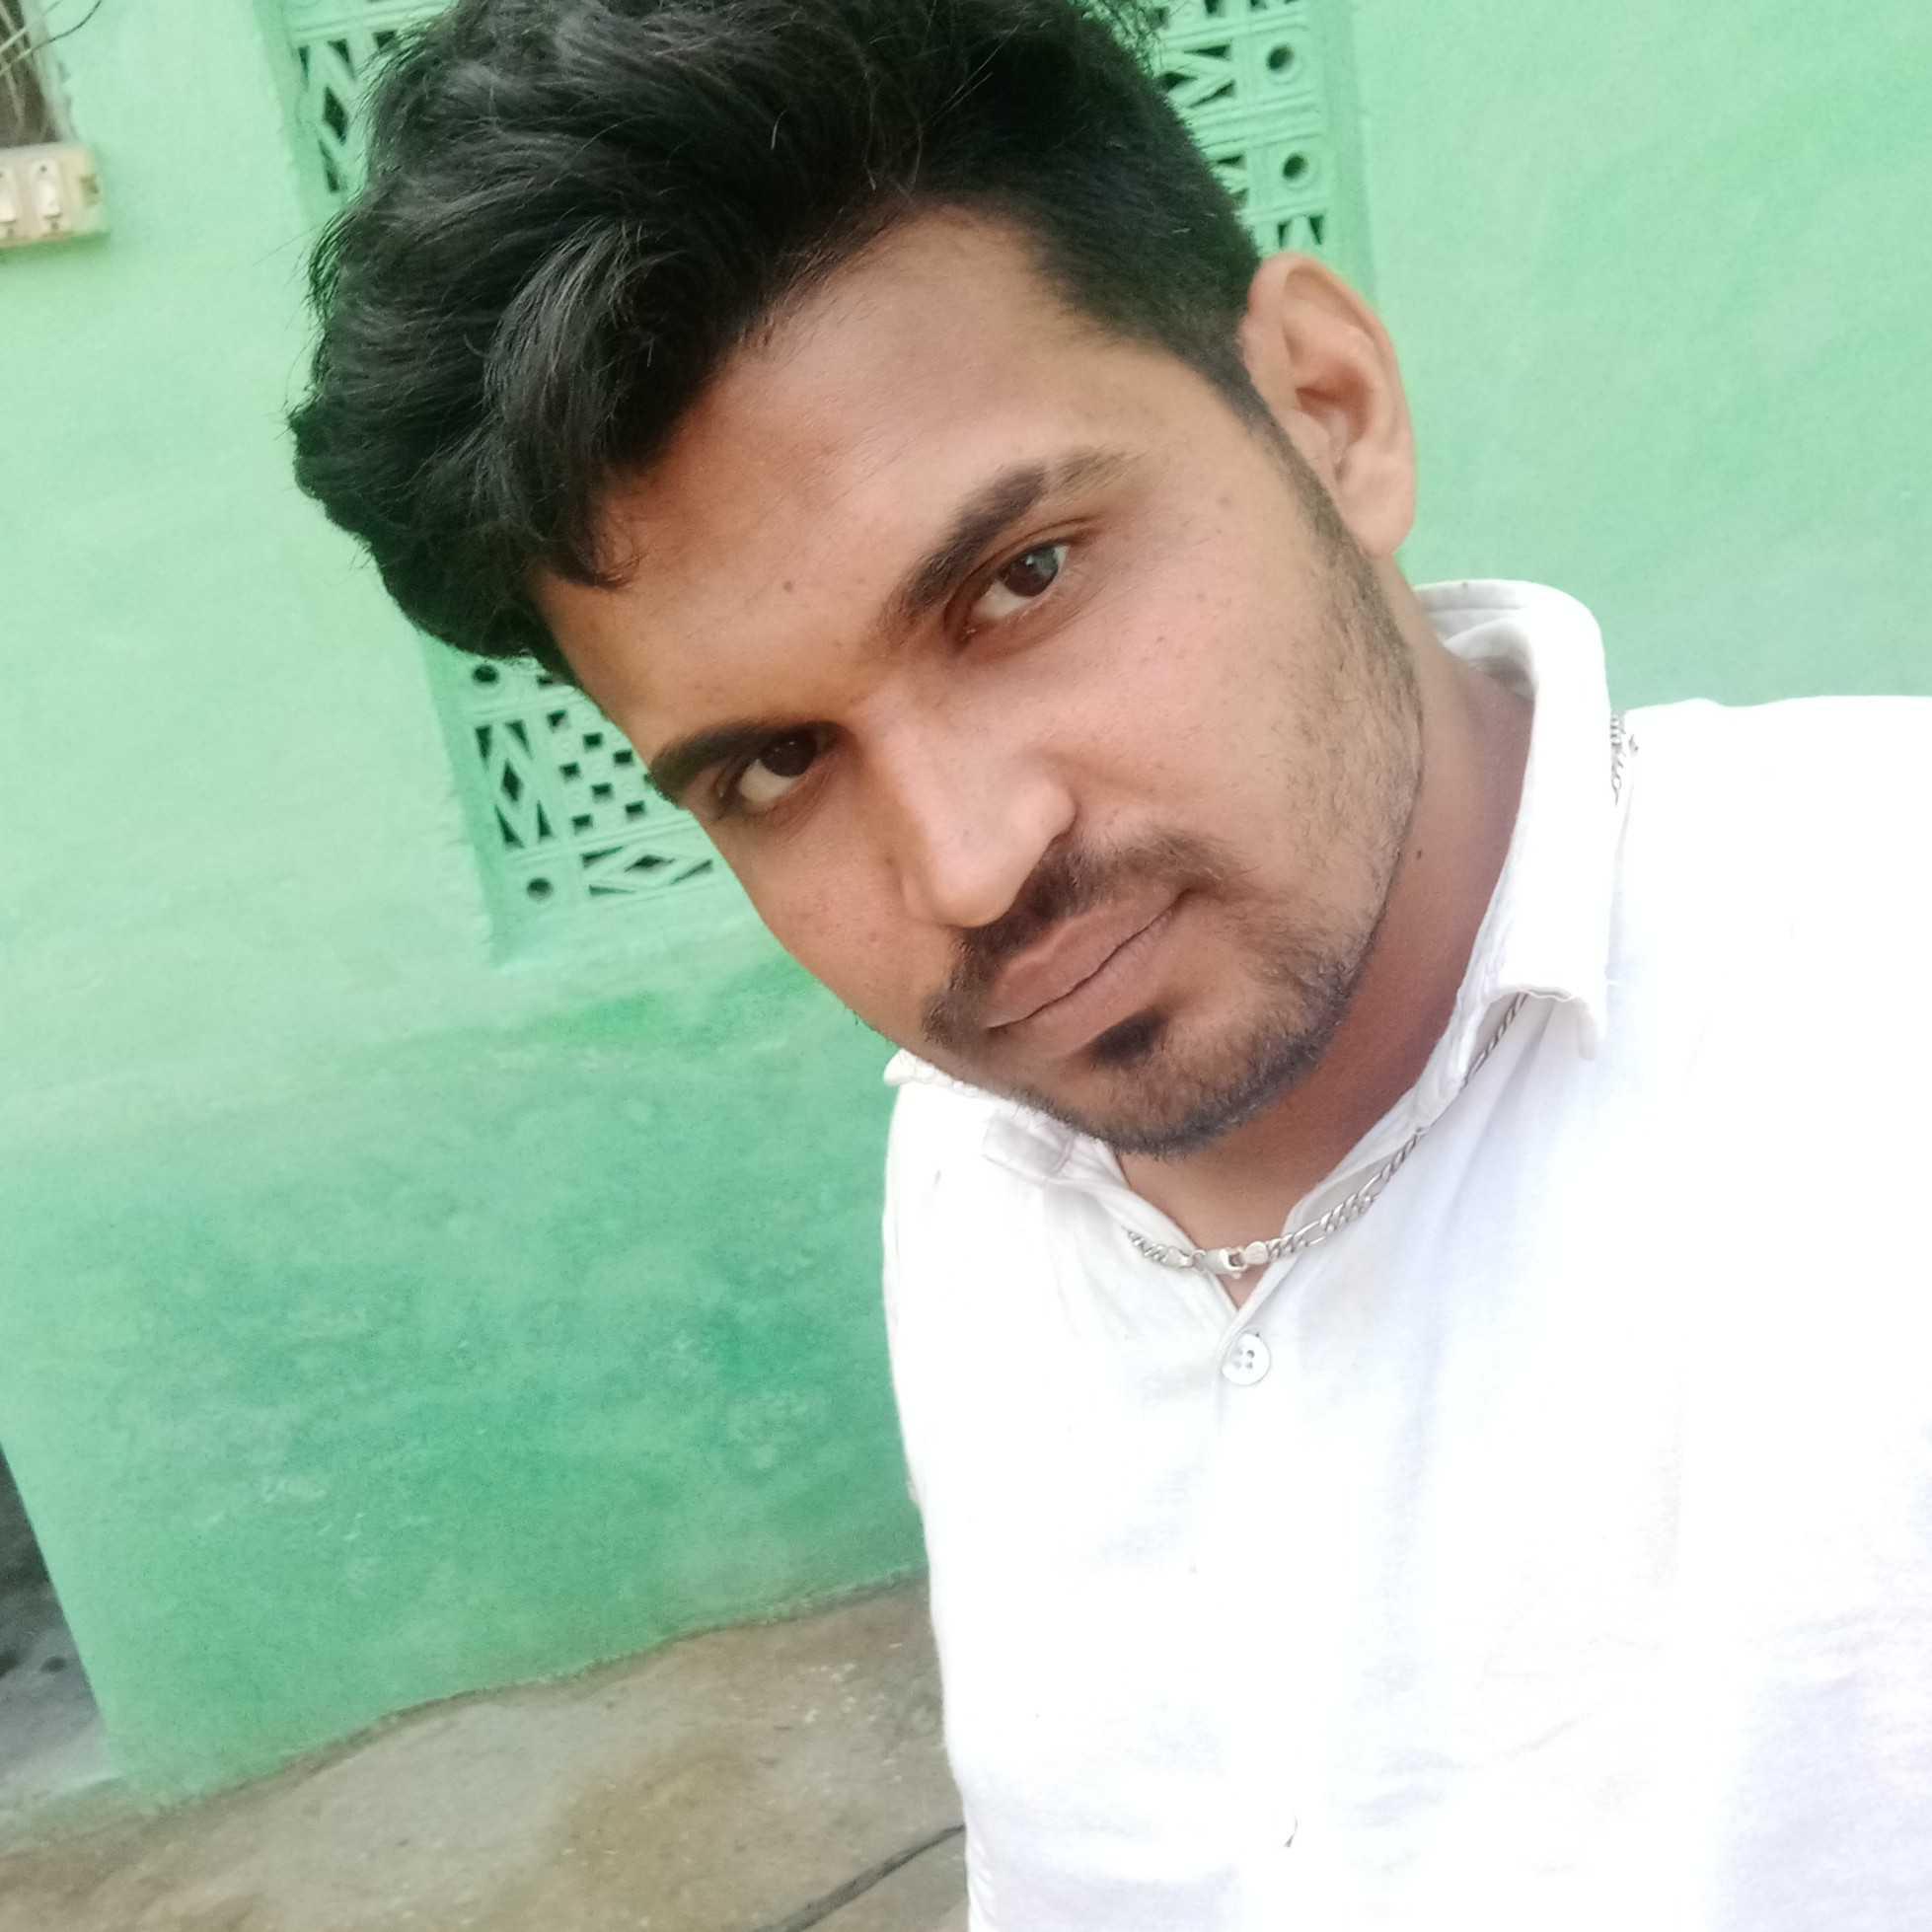 Sandeep Chhimpa Sandeep Chhimpa